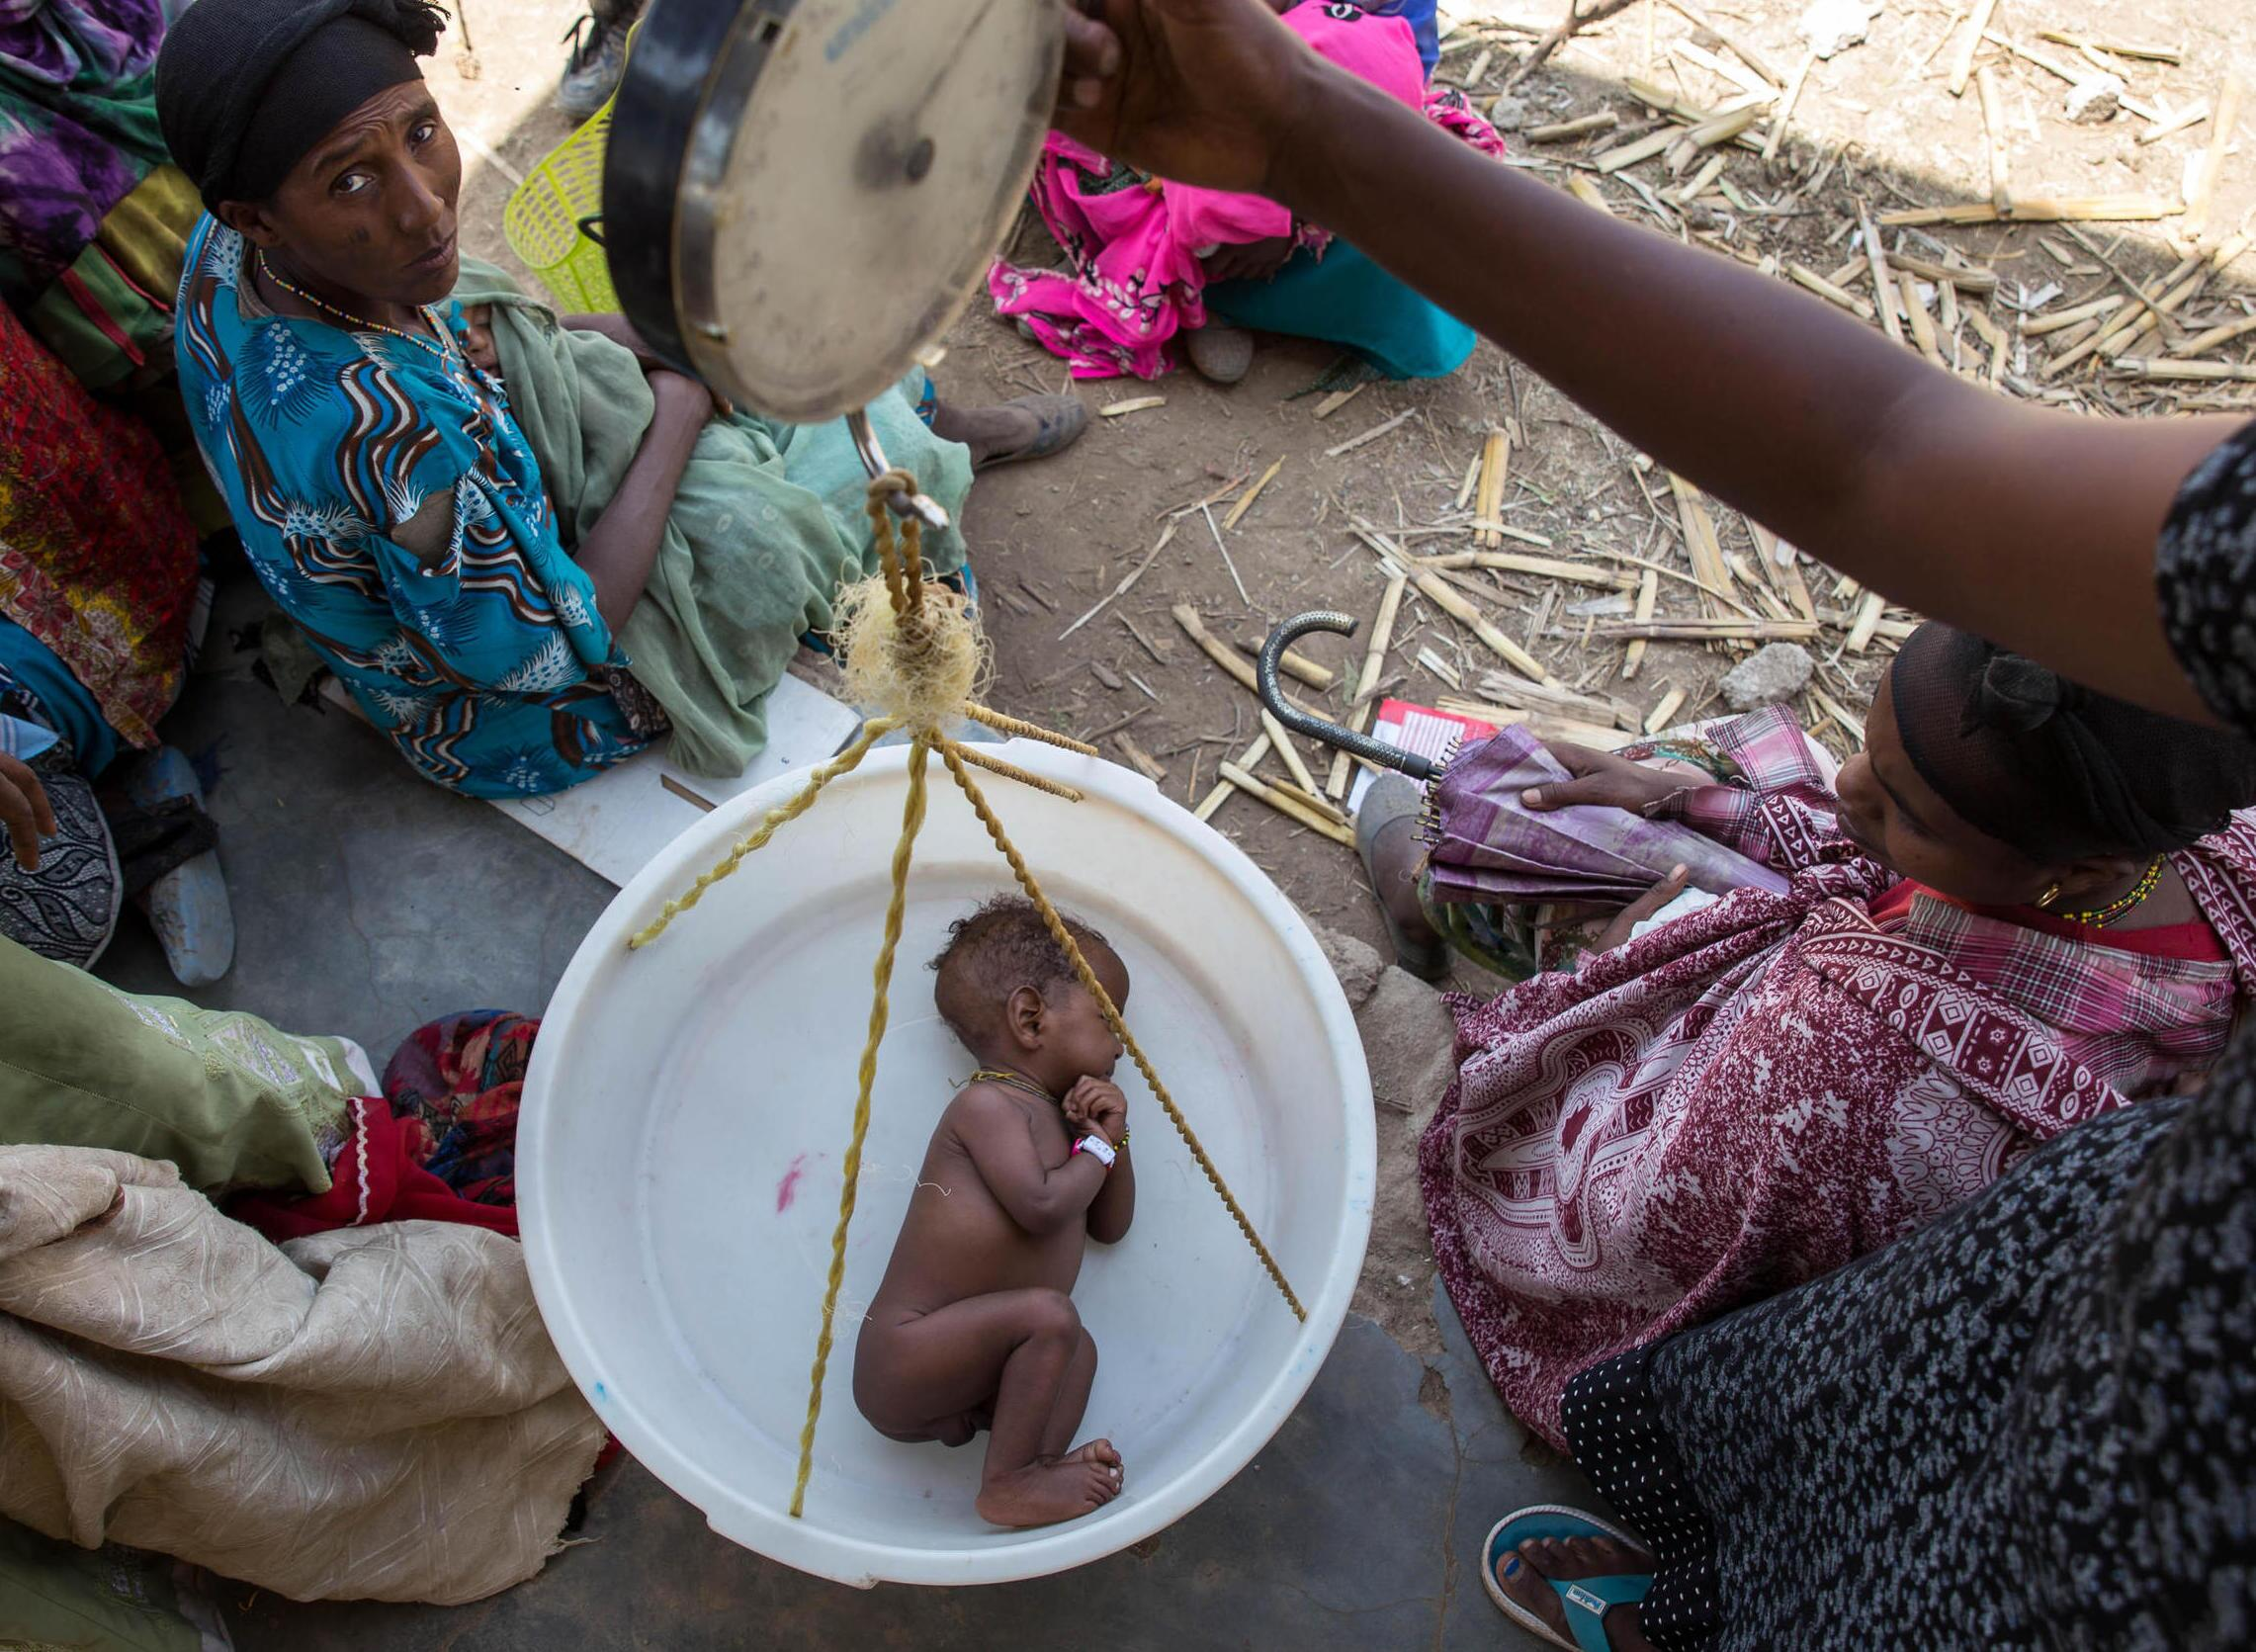 Bild zu UNICEF, El Nino, United Internet for UNICEF